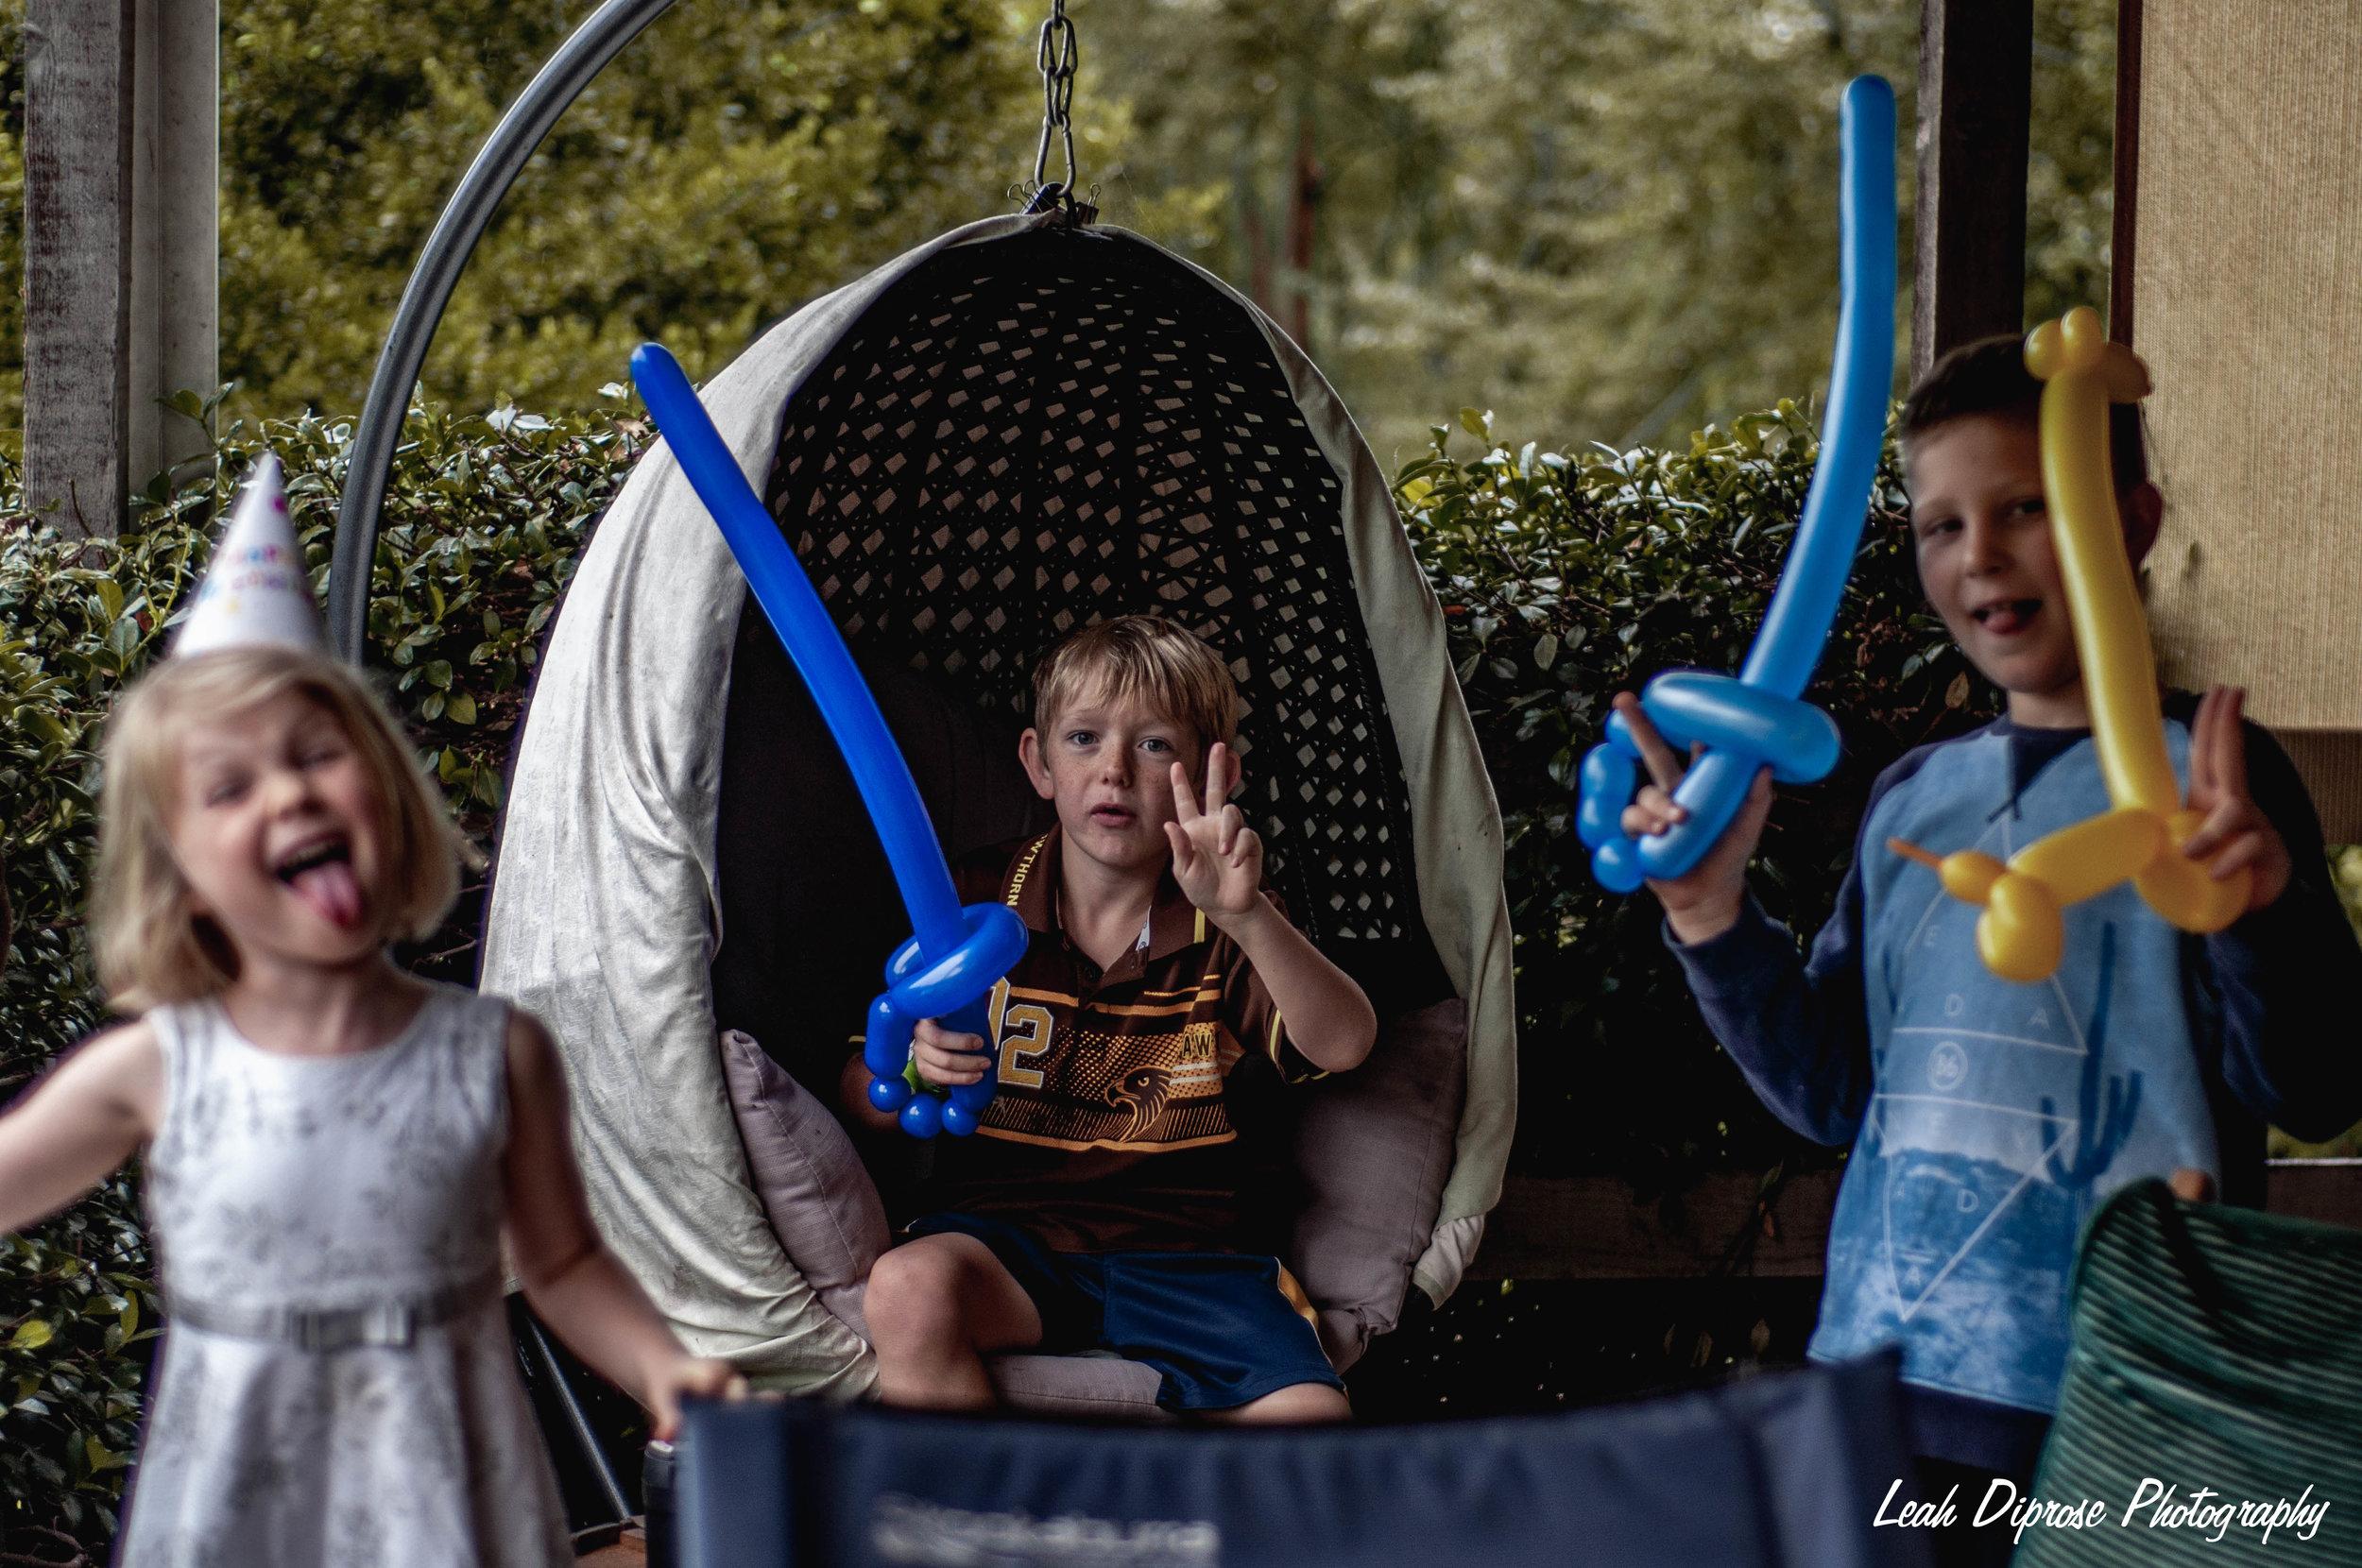 Leah Diprose Photography image-6730.jpg